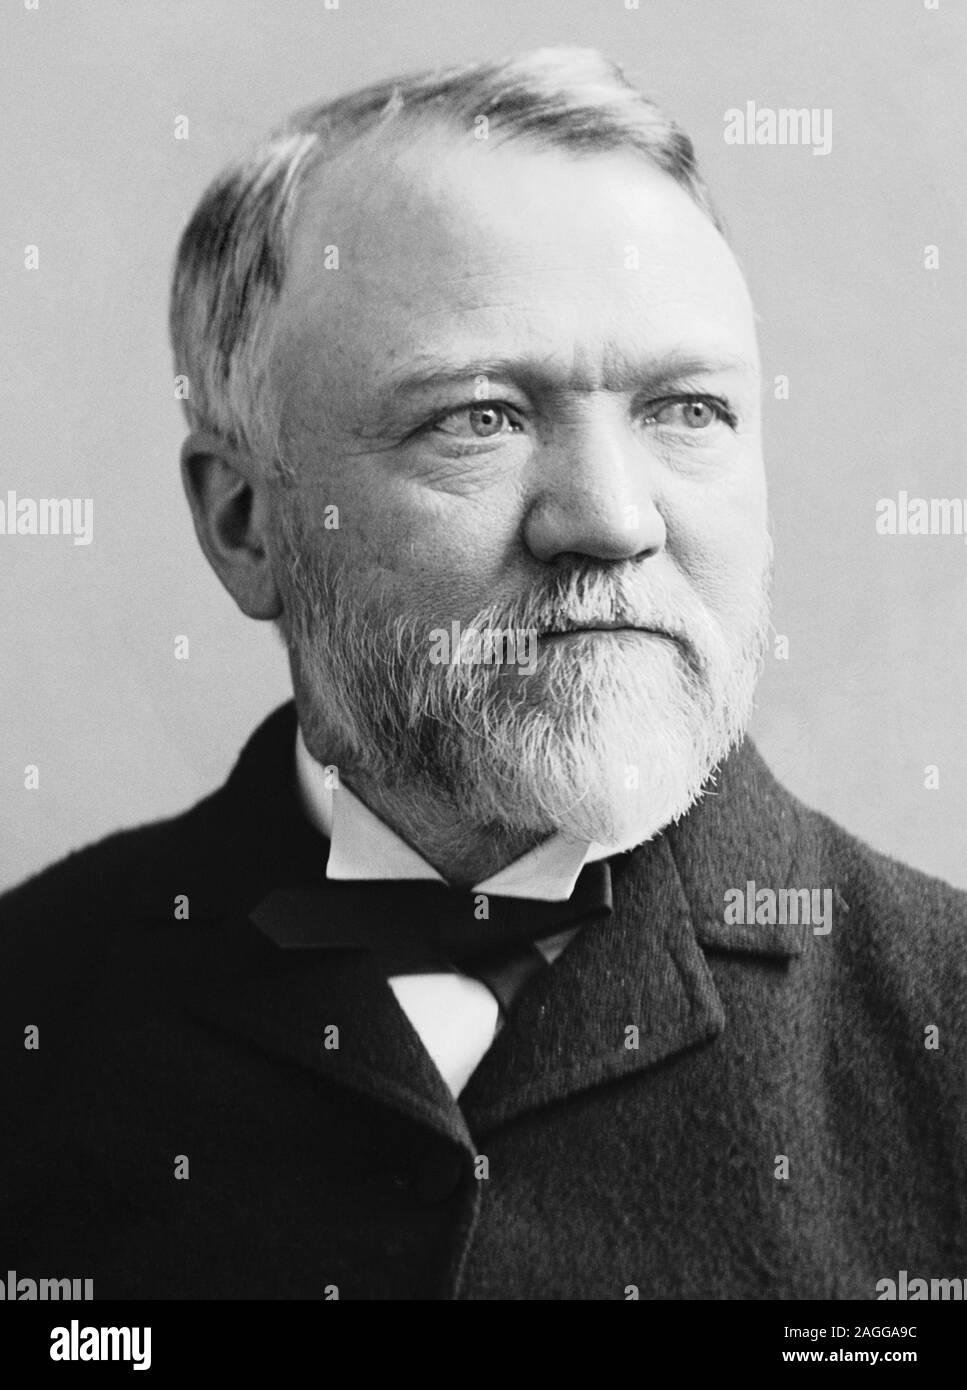 Vintage portrait photo of Scottish-American industrialist and philanthropist Andrew Carnegie (1835 – 1919). Photo circa 1880 by Brady-Handy. Stock Photo